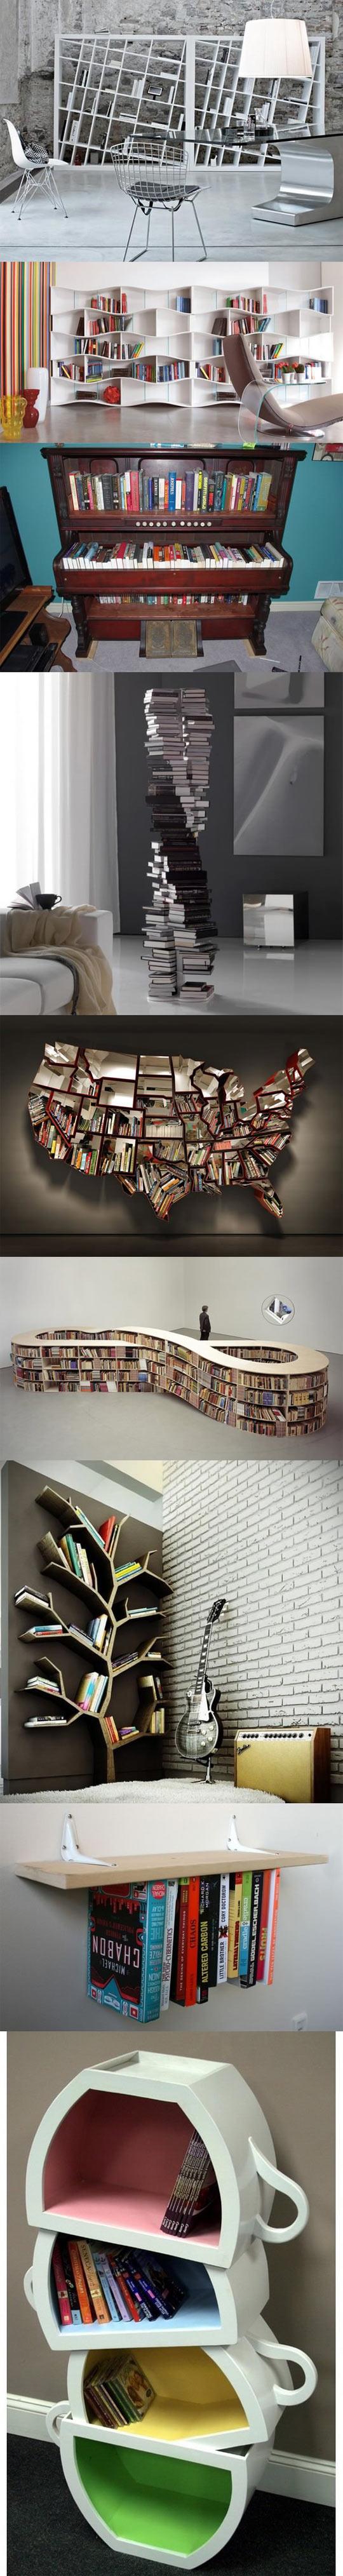 funny-books-shelf-stairs-wood-furniture-piano